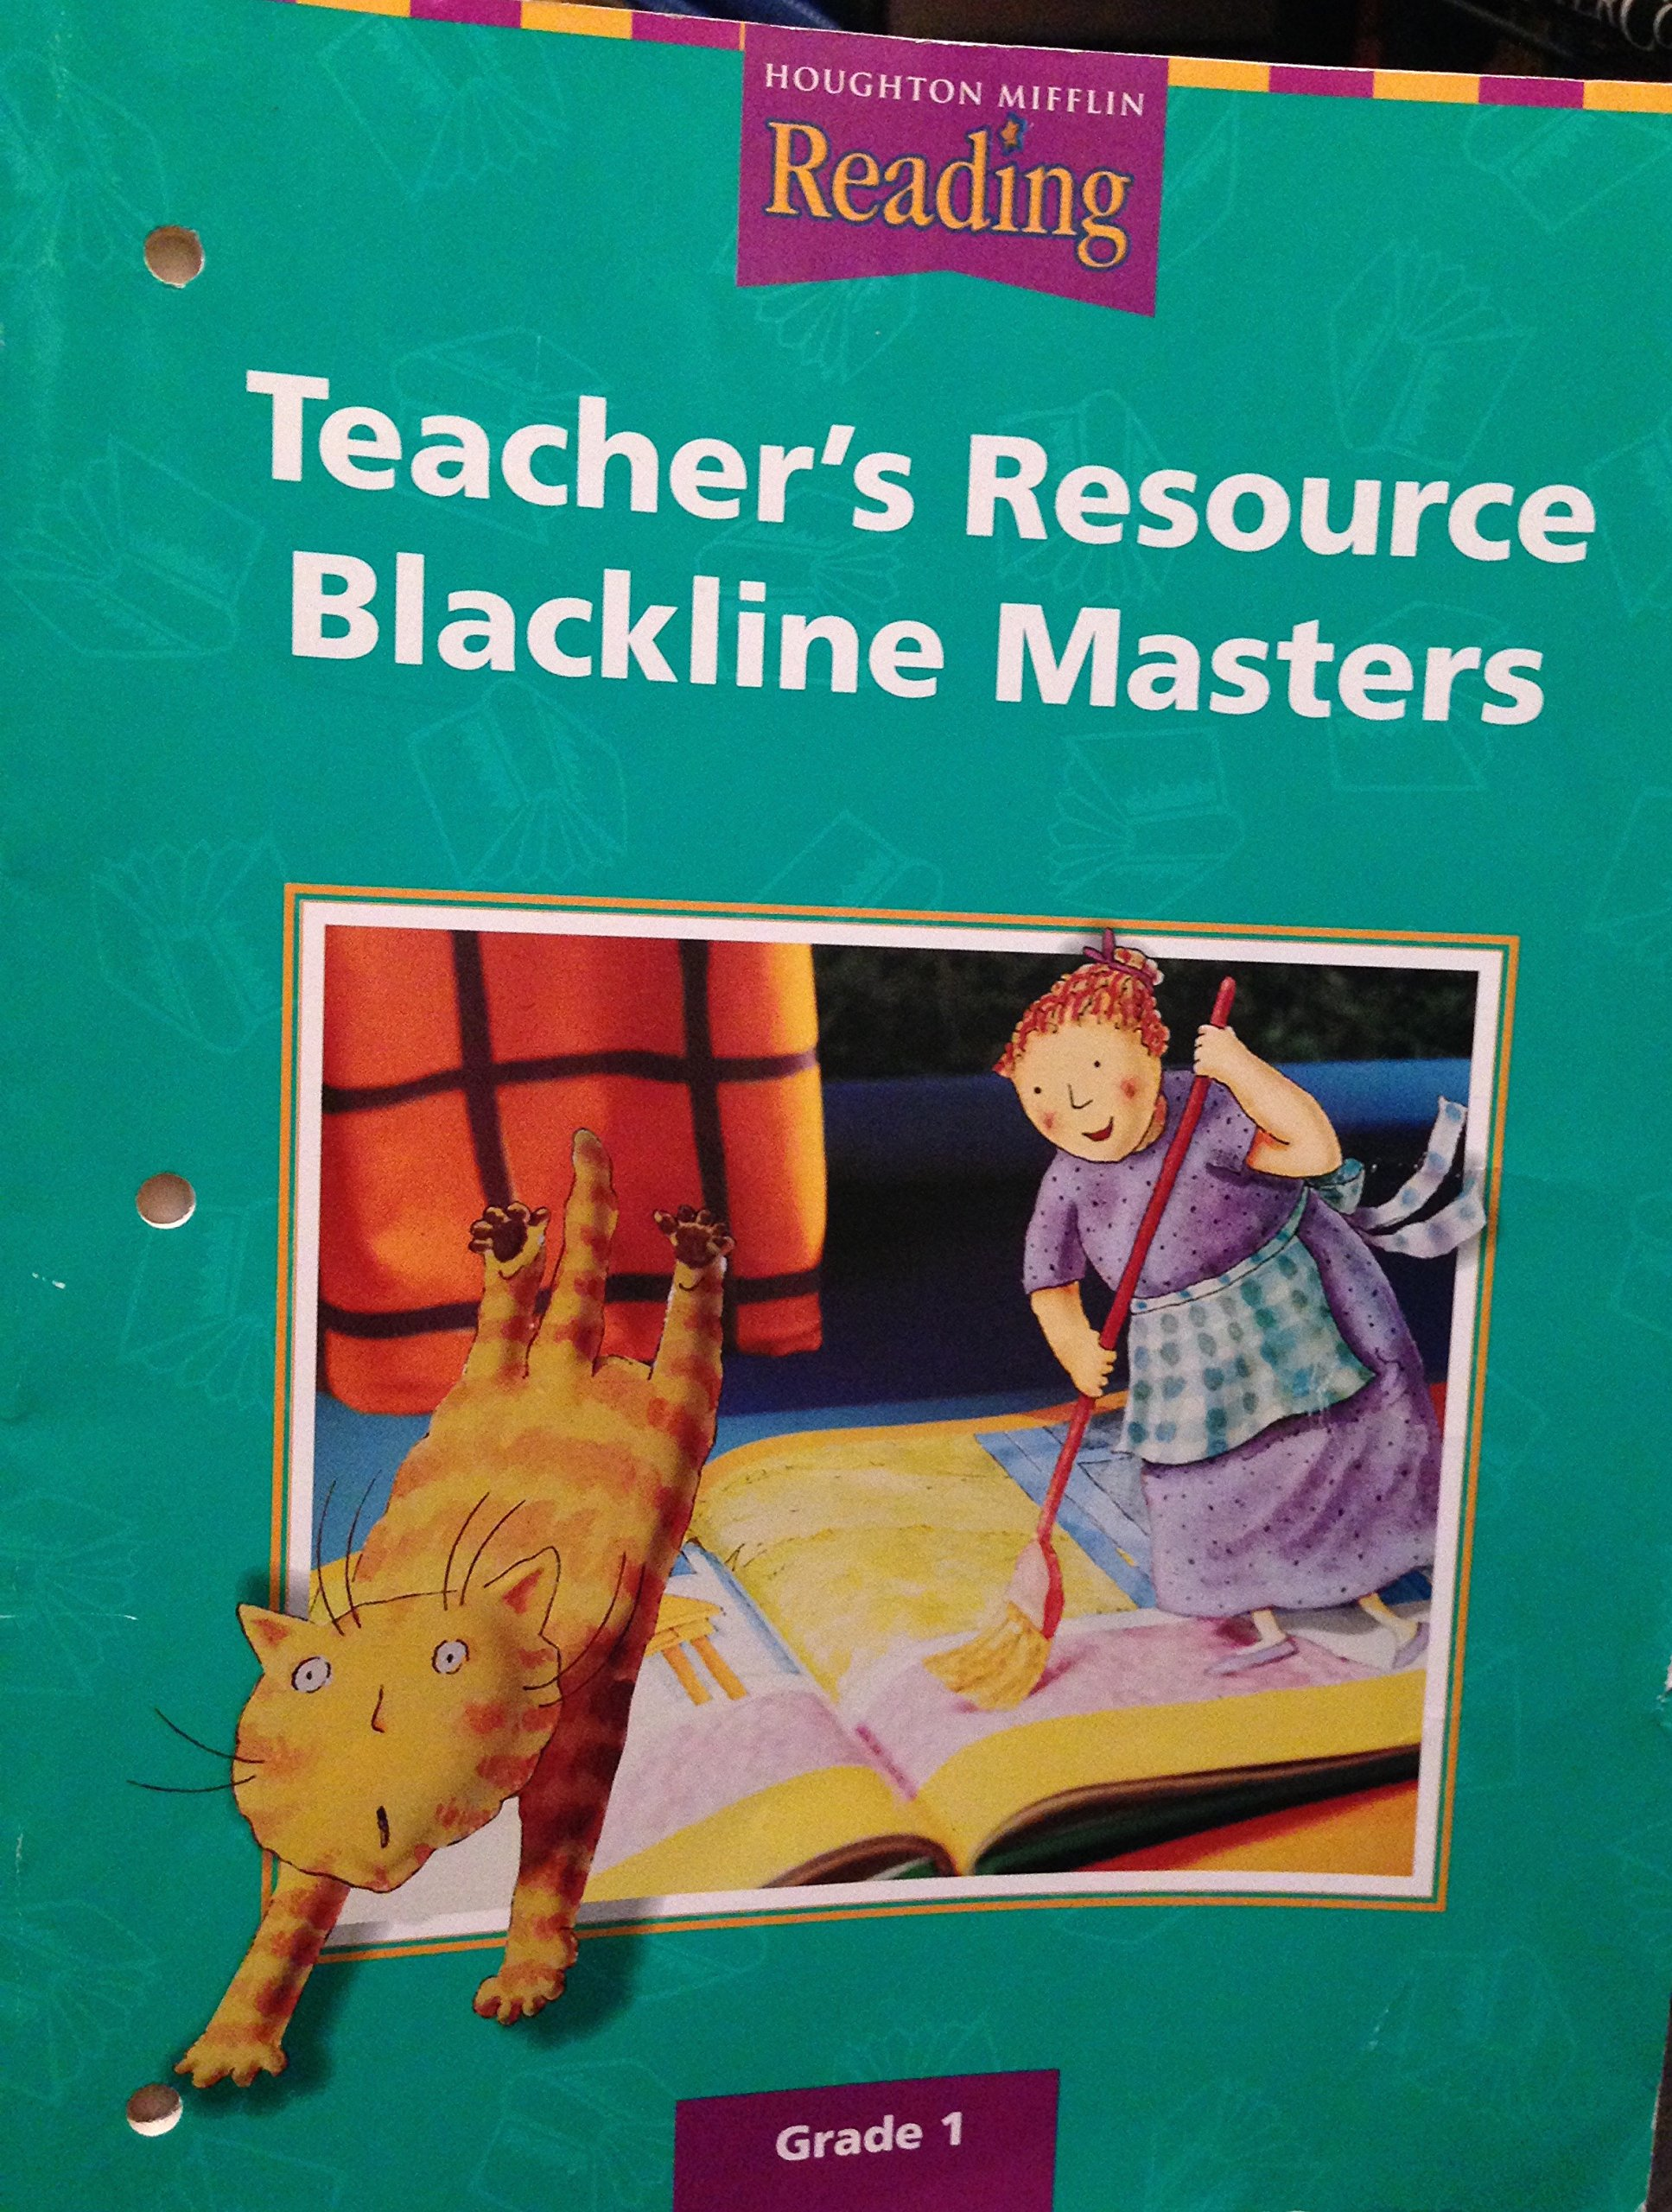 Download Houghton Mifflin Reading: Teacher's Resource Blackline Masters, Grade 1 pdf